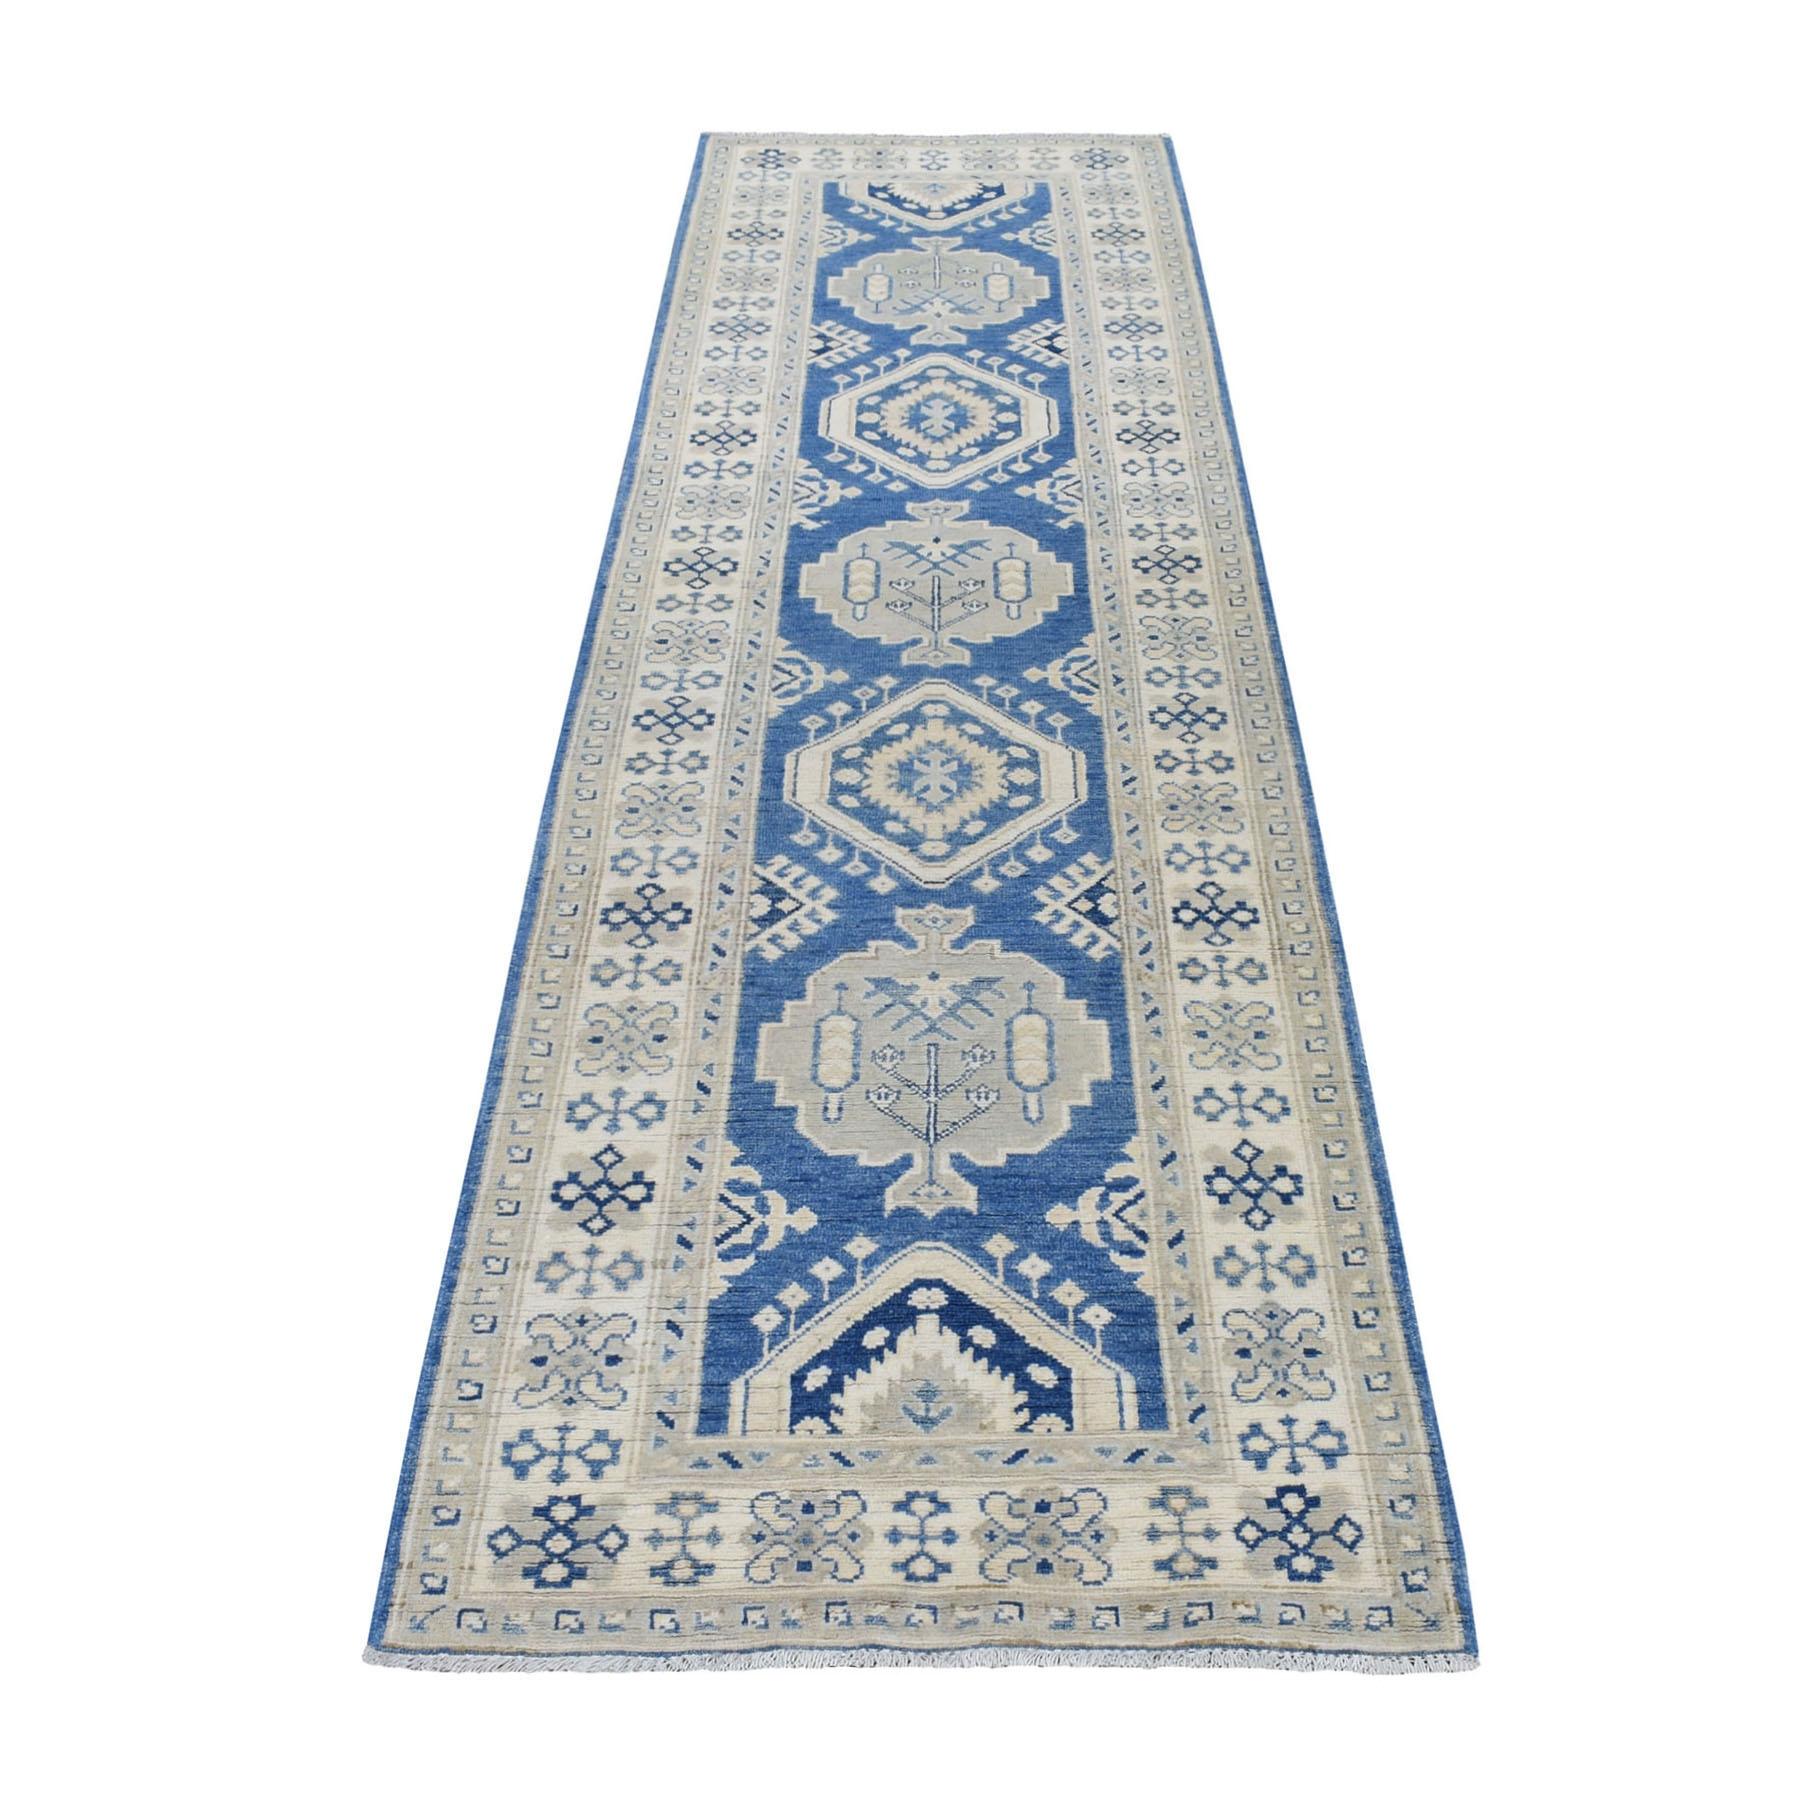 "2'9""x9'7"" Blue Vintage Look Kazak Pure Wool Tribal Design Hand Knotted Runner Oriental Rug"